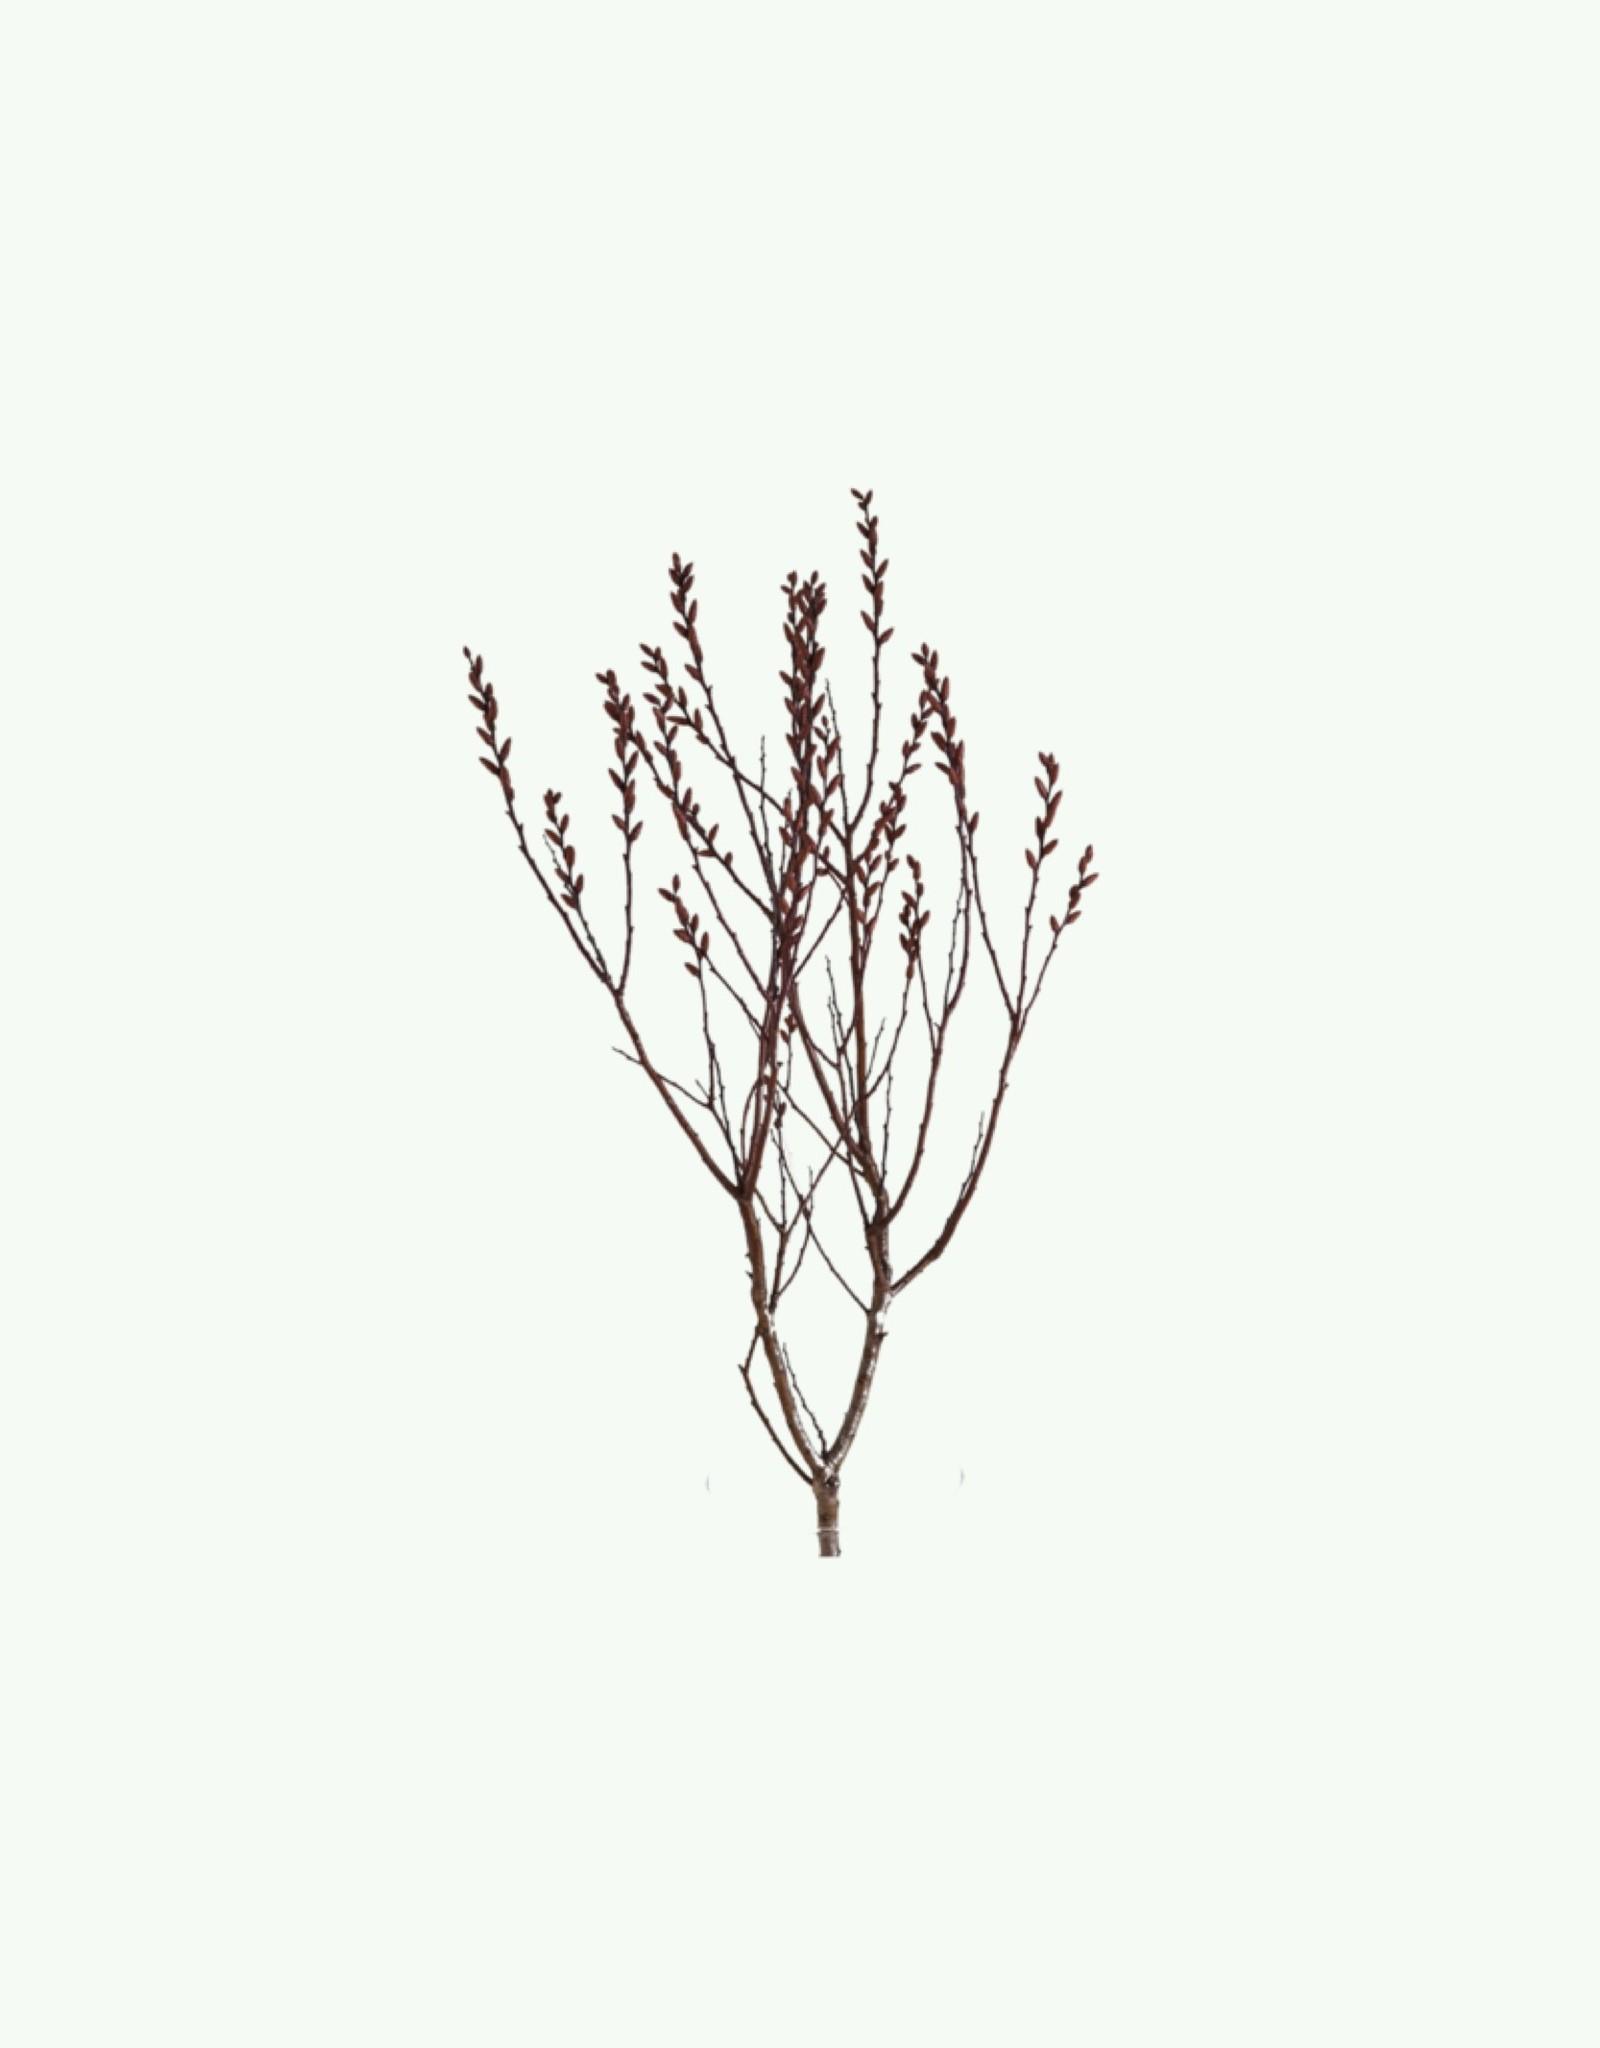 Haeckels Haeckels - Bog Myrtle - Incense Cone